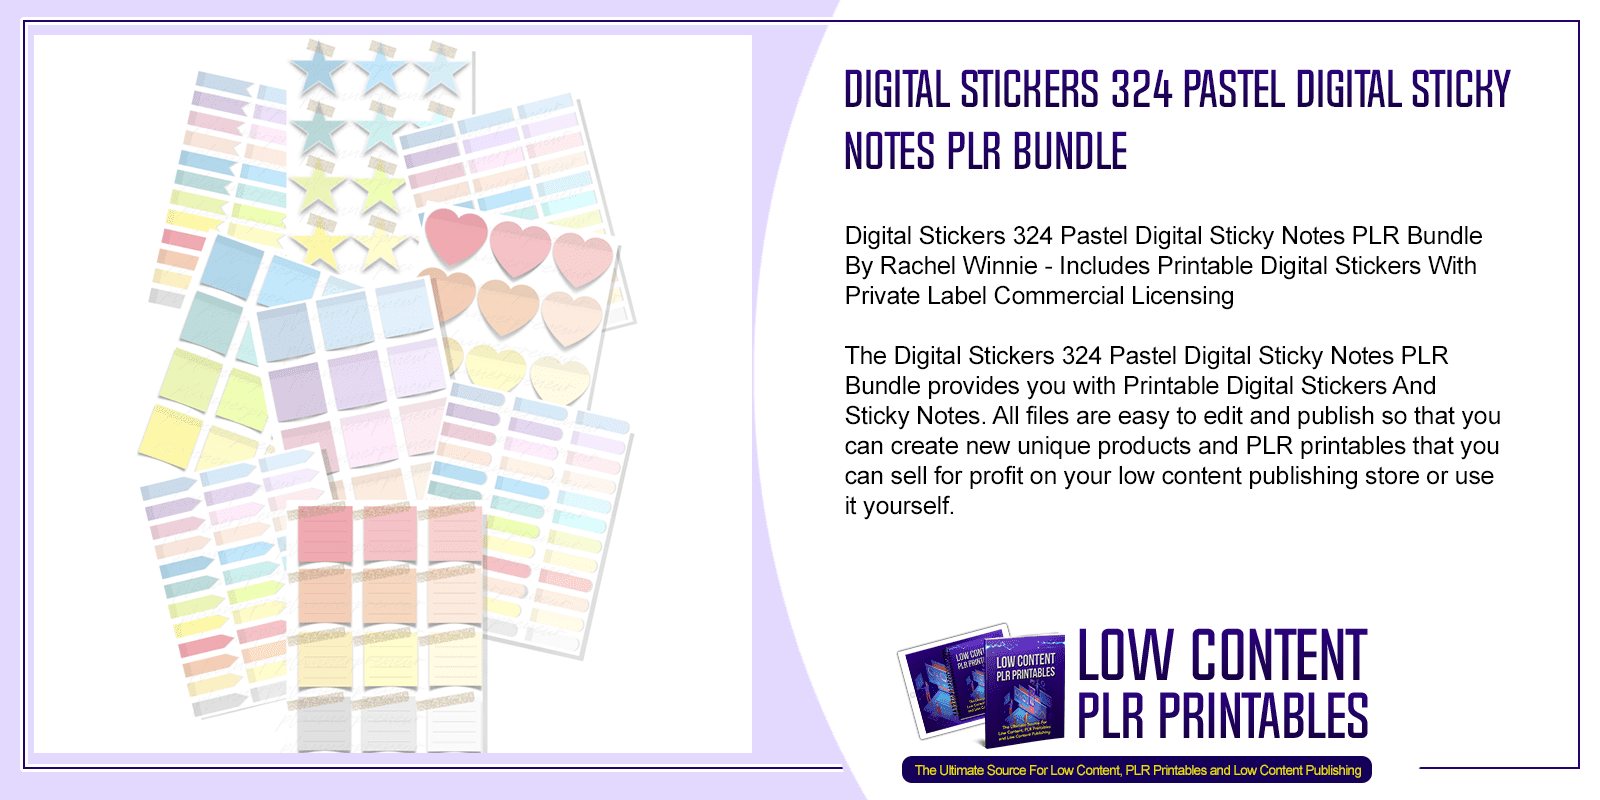 Digital Stickers 324 Pastel Digital Sticky Notes PLR Bundle